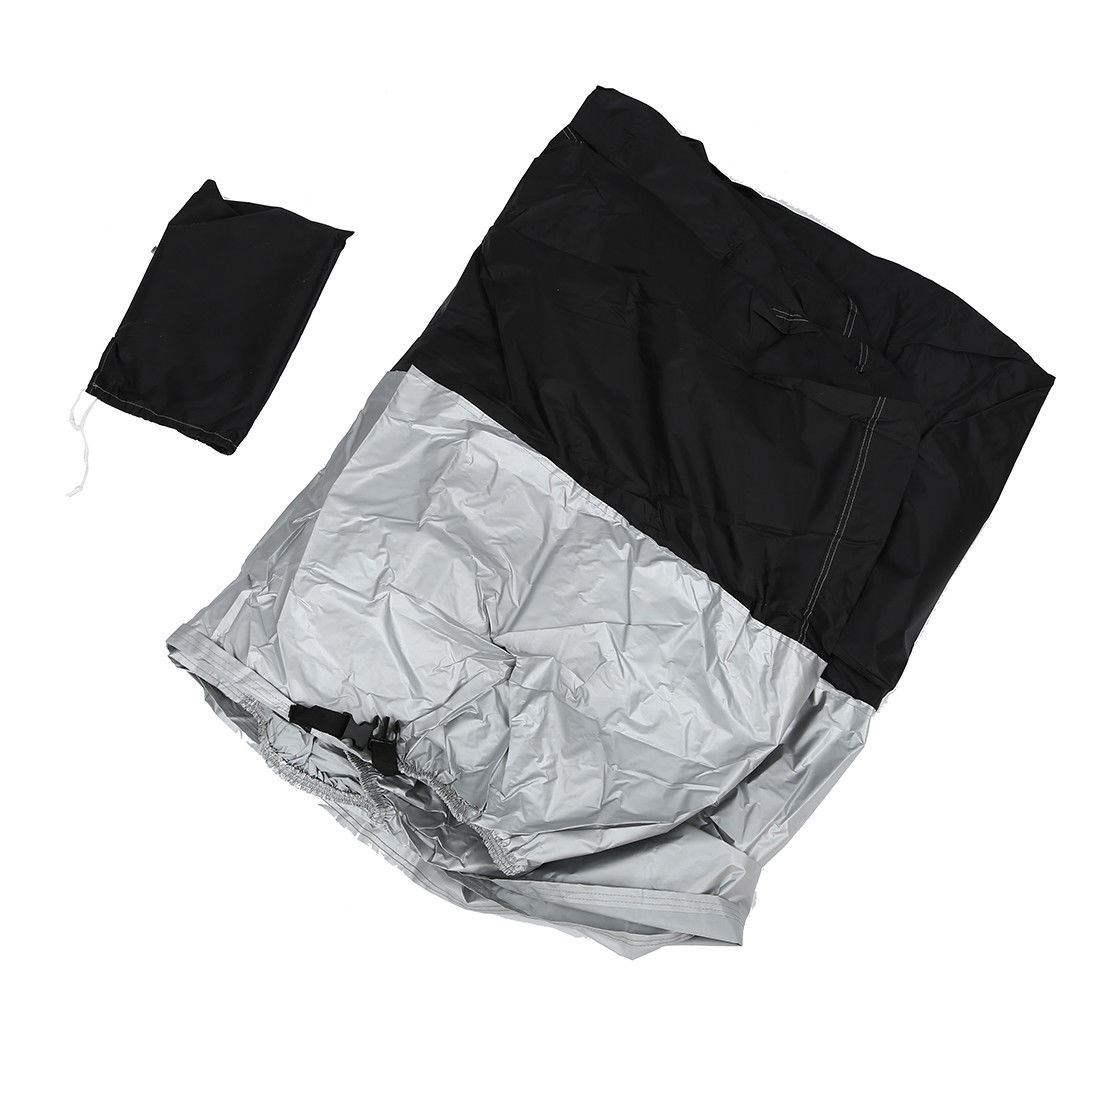 Funda-Impermeable-Protectora-Cubre-Moto-Cosida-Muy-Resistente-Tallas-M-XXL miniatura 13